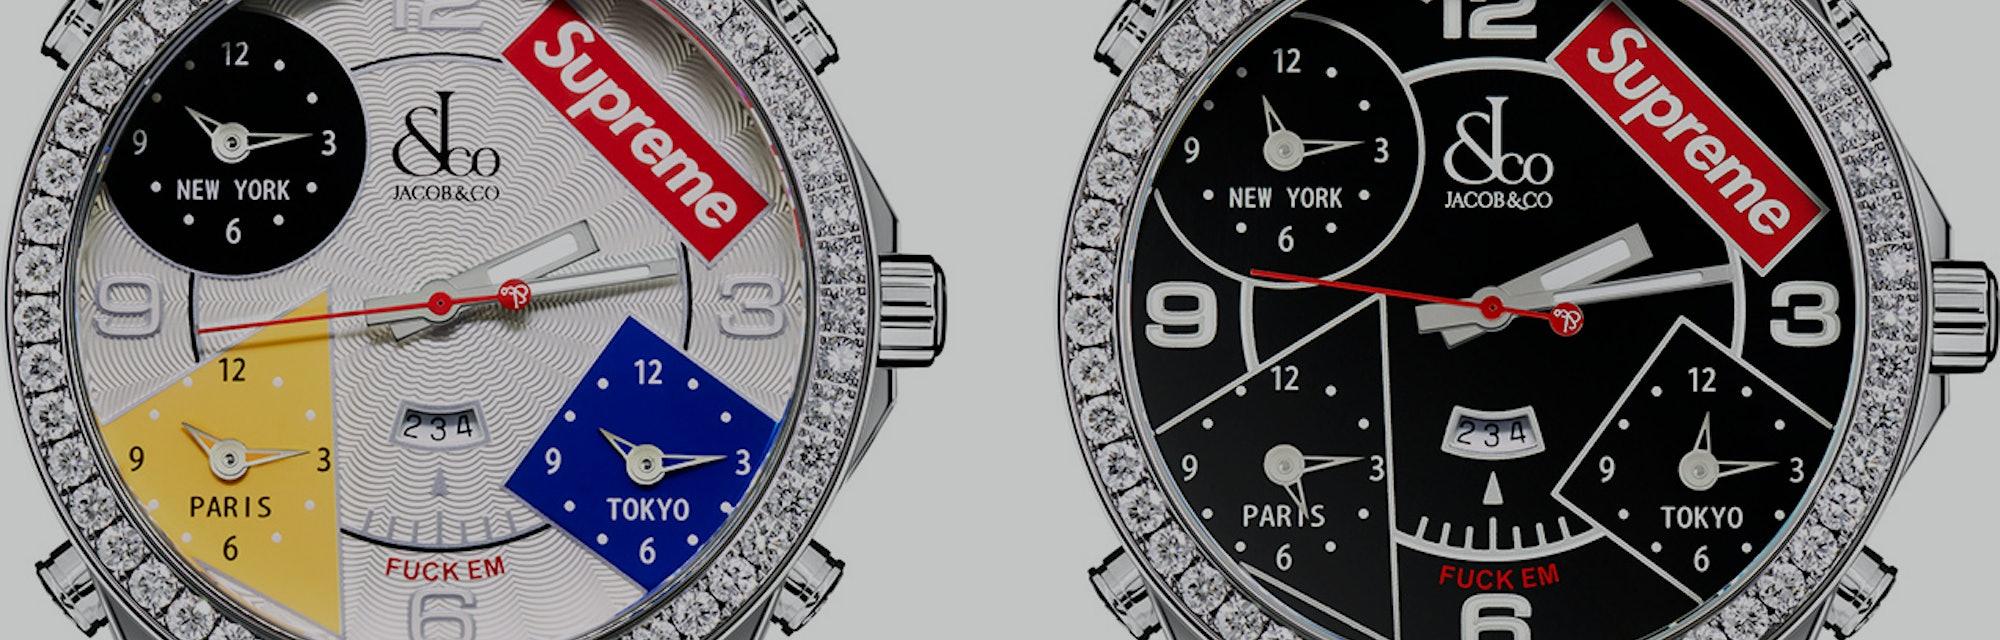 Supreme Jacob & Co. Diamond Watch